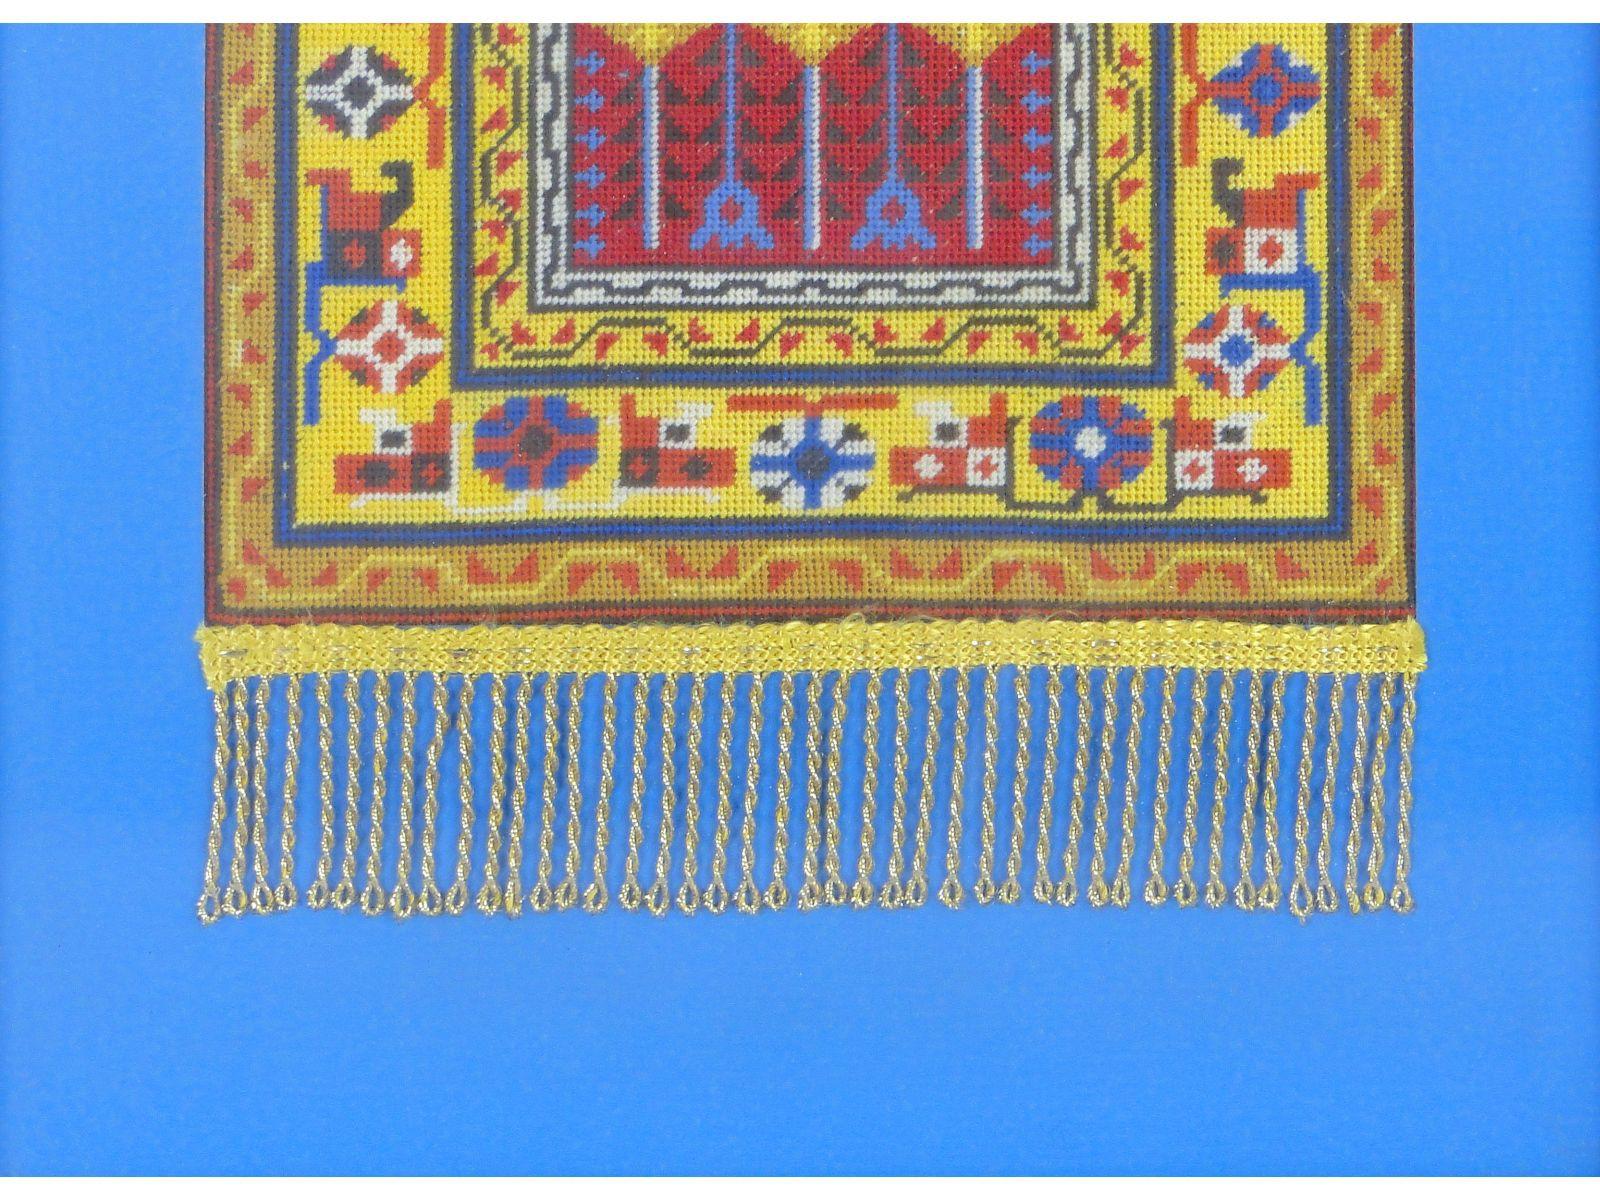 DSC05175.JPG (1600×1200)